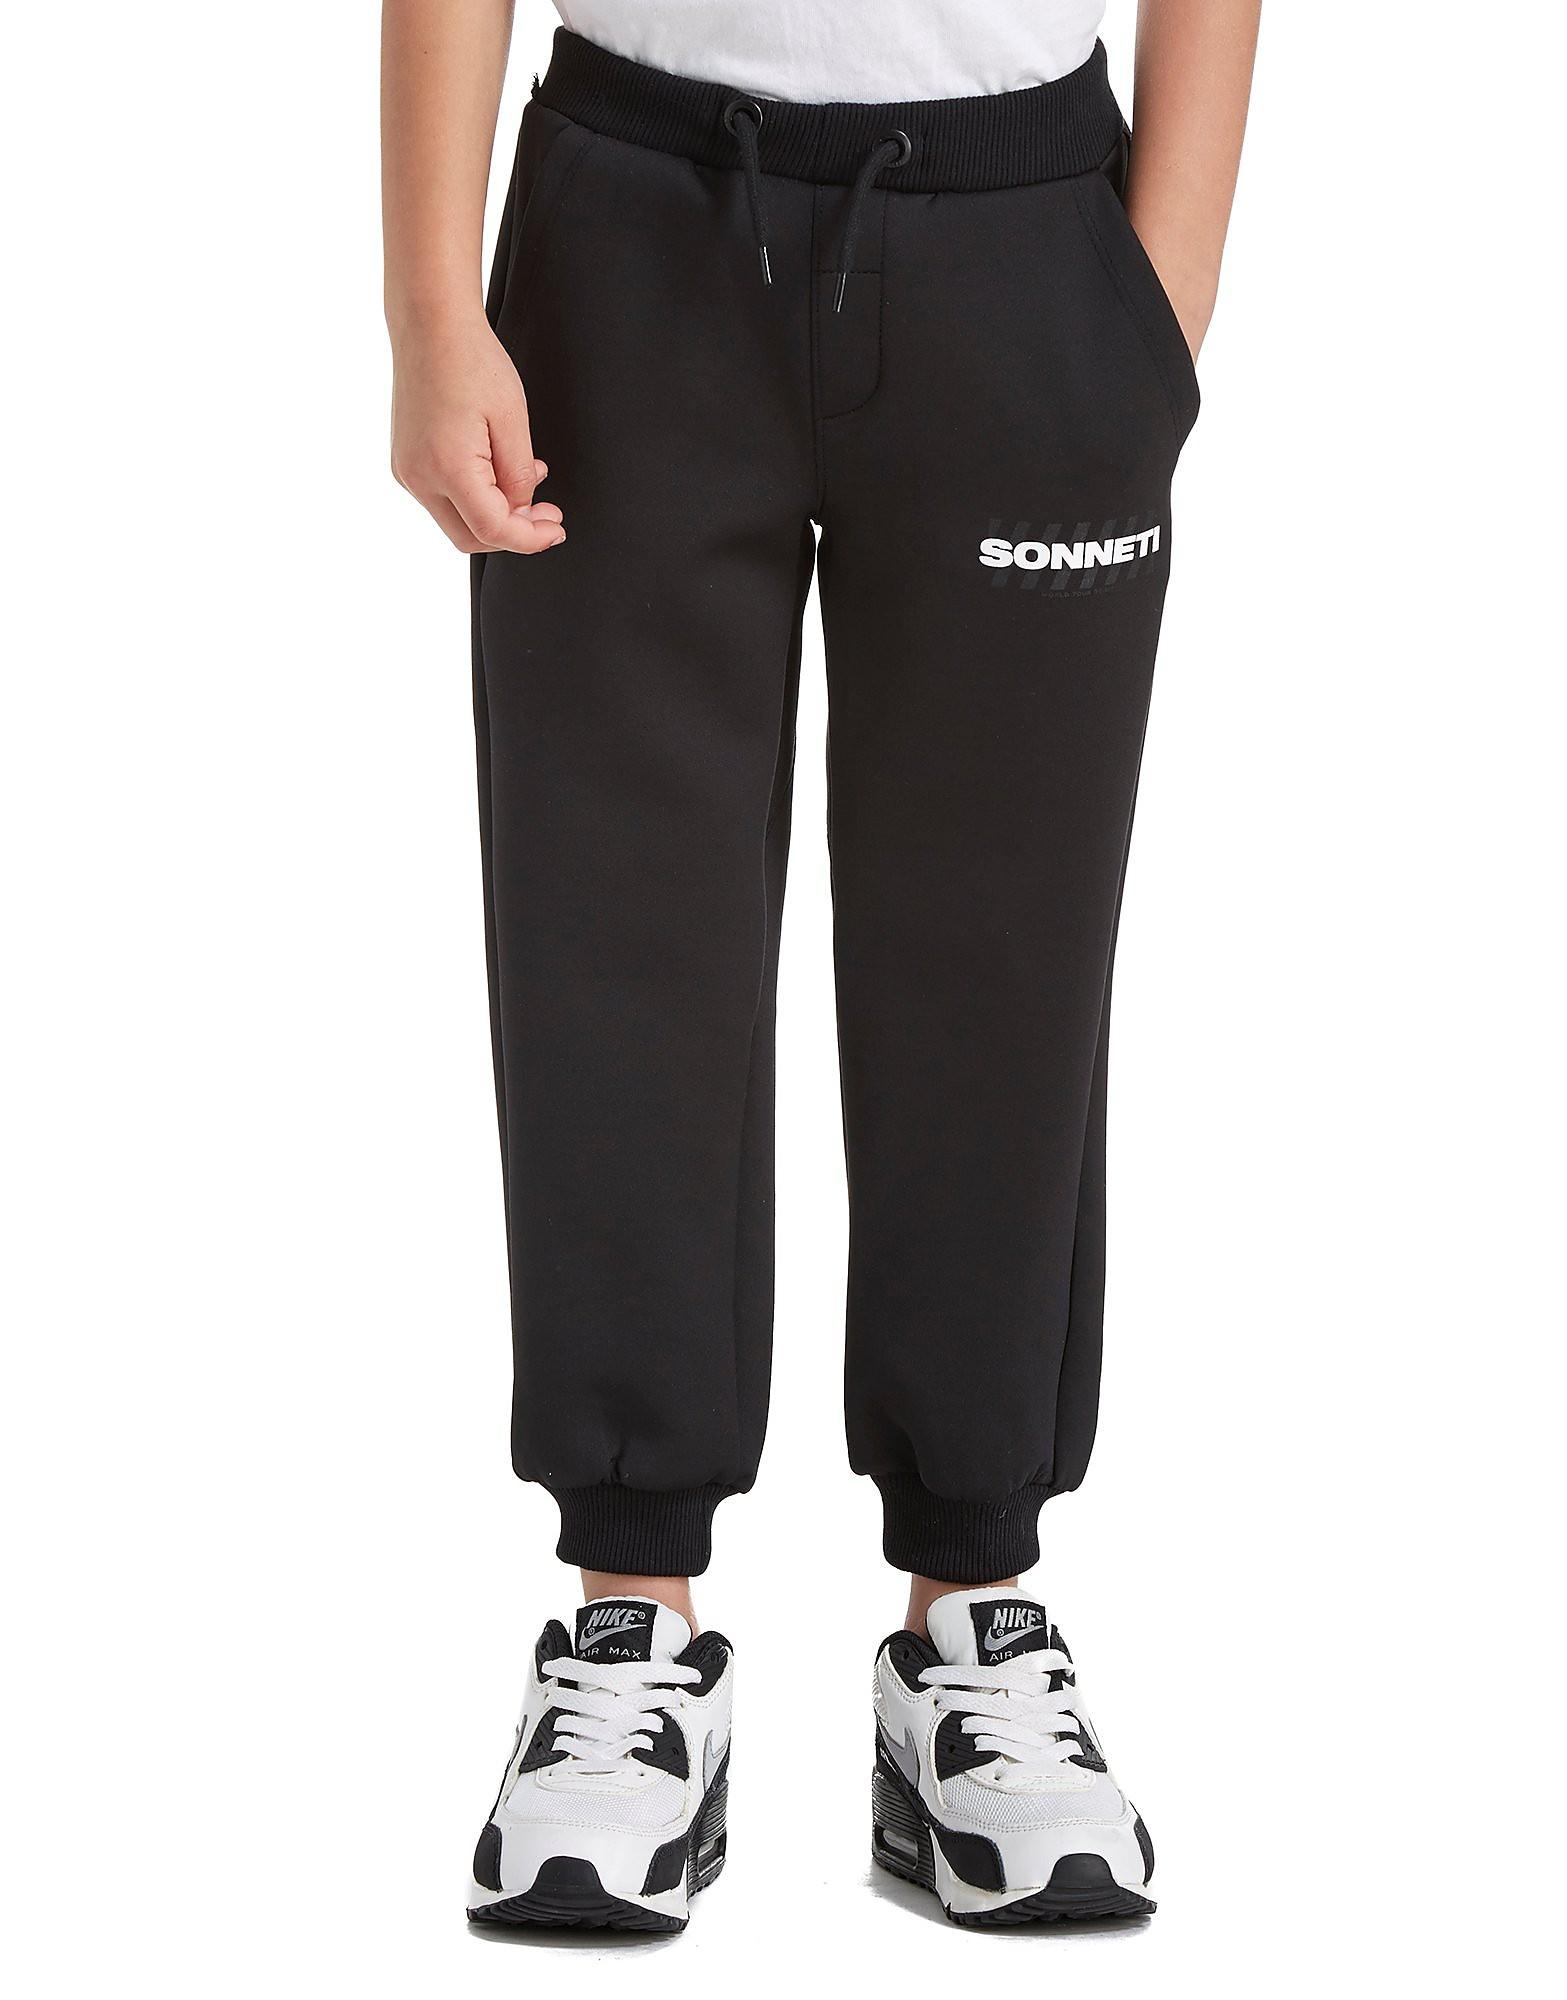 Sonneti Droid Track Pants Childrens